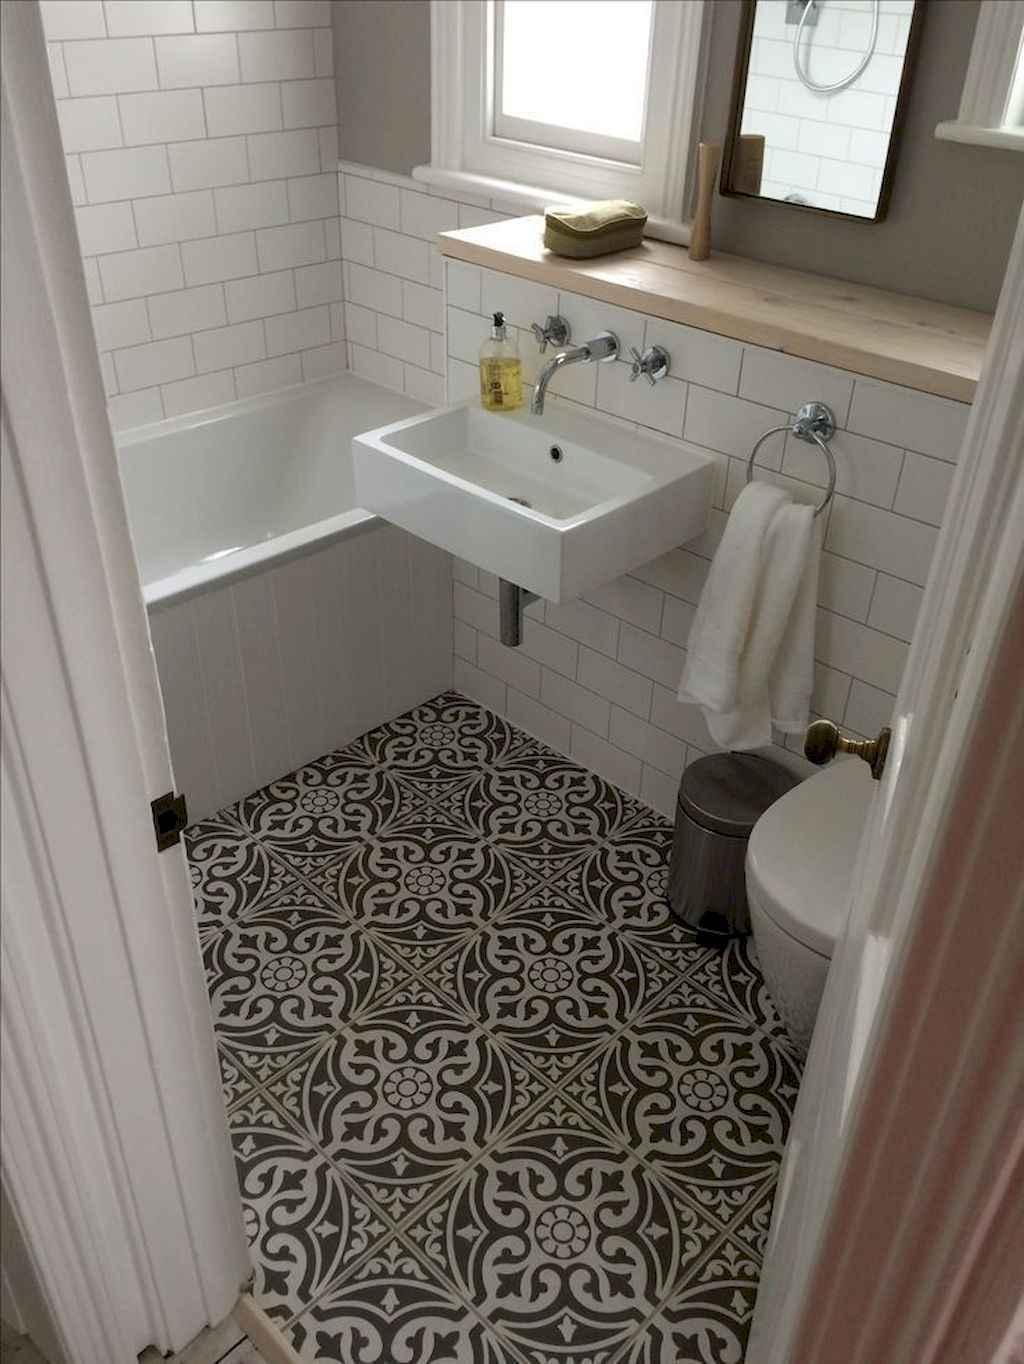 111 Brilliant Small Bathroom Remodel Ideas On A Budget (22)